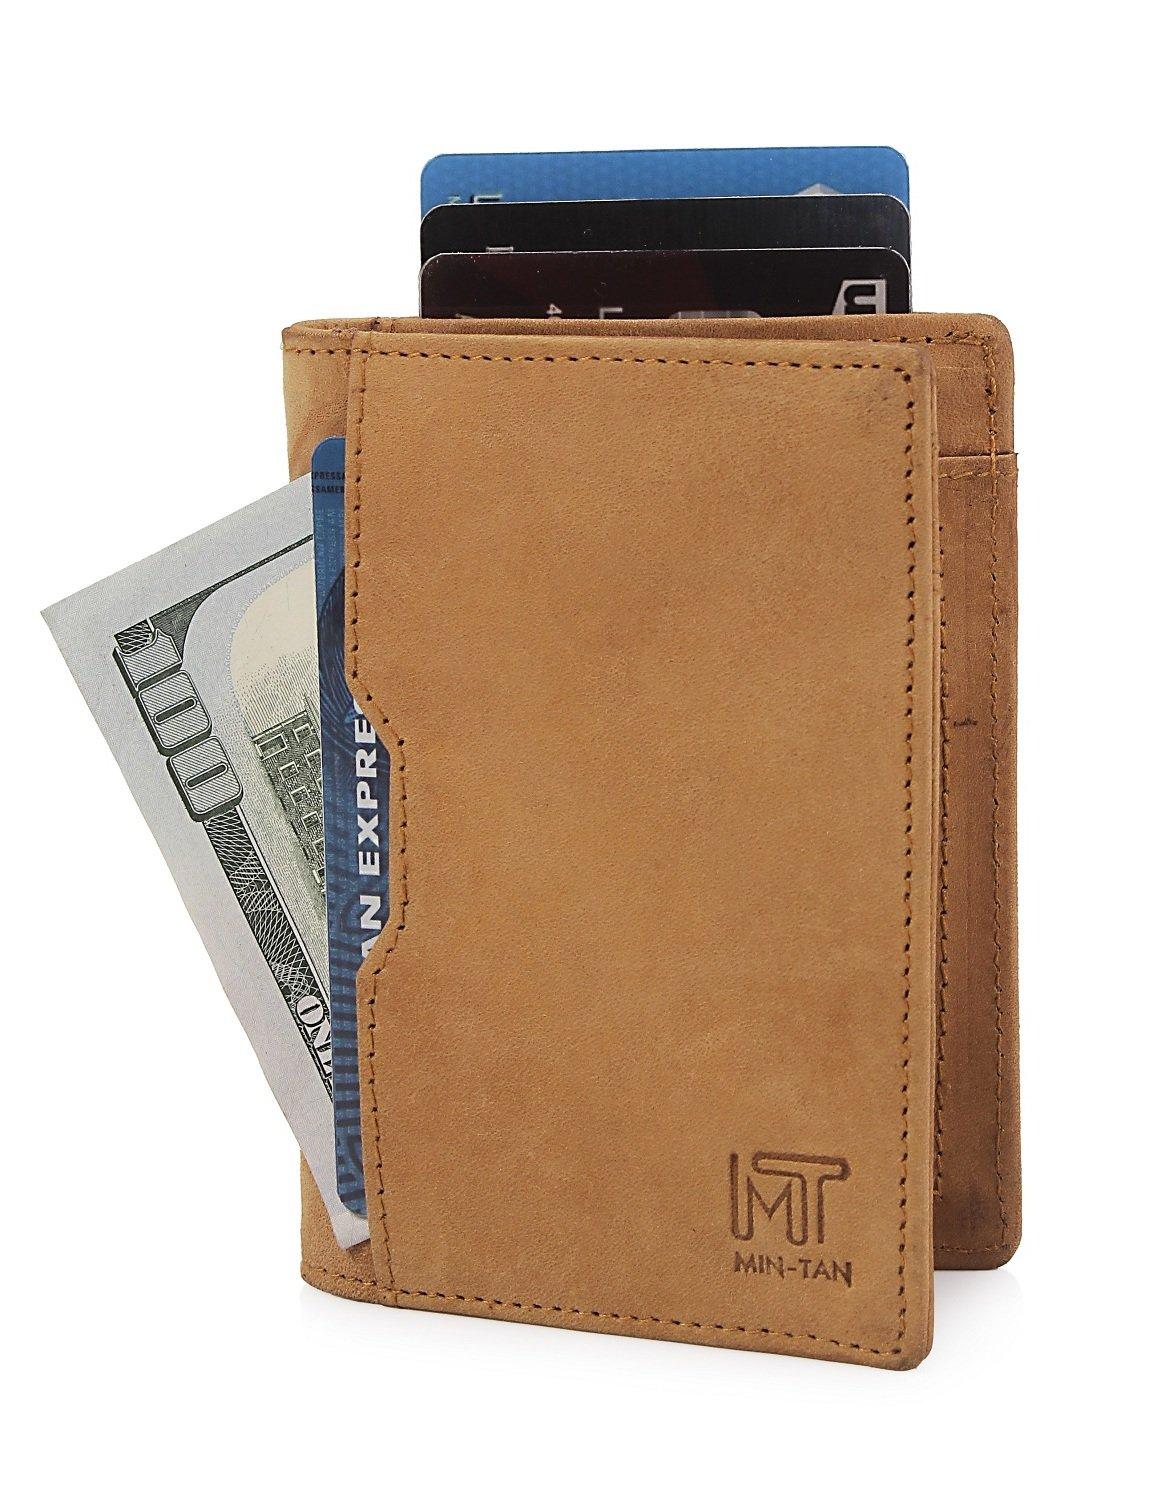 Wallets for Men Slim Mens leather RFID Blocking Minimalist Card Front Pocket Bifold Travel Thin (Camel)